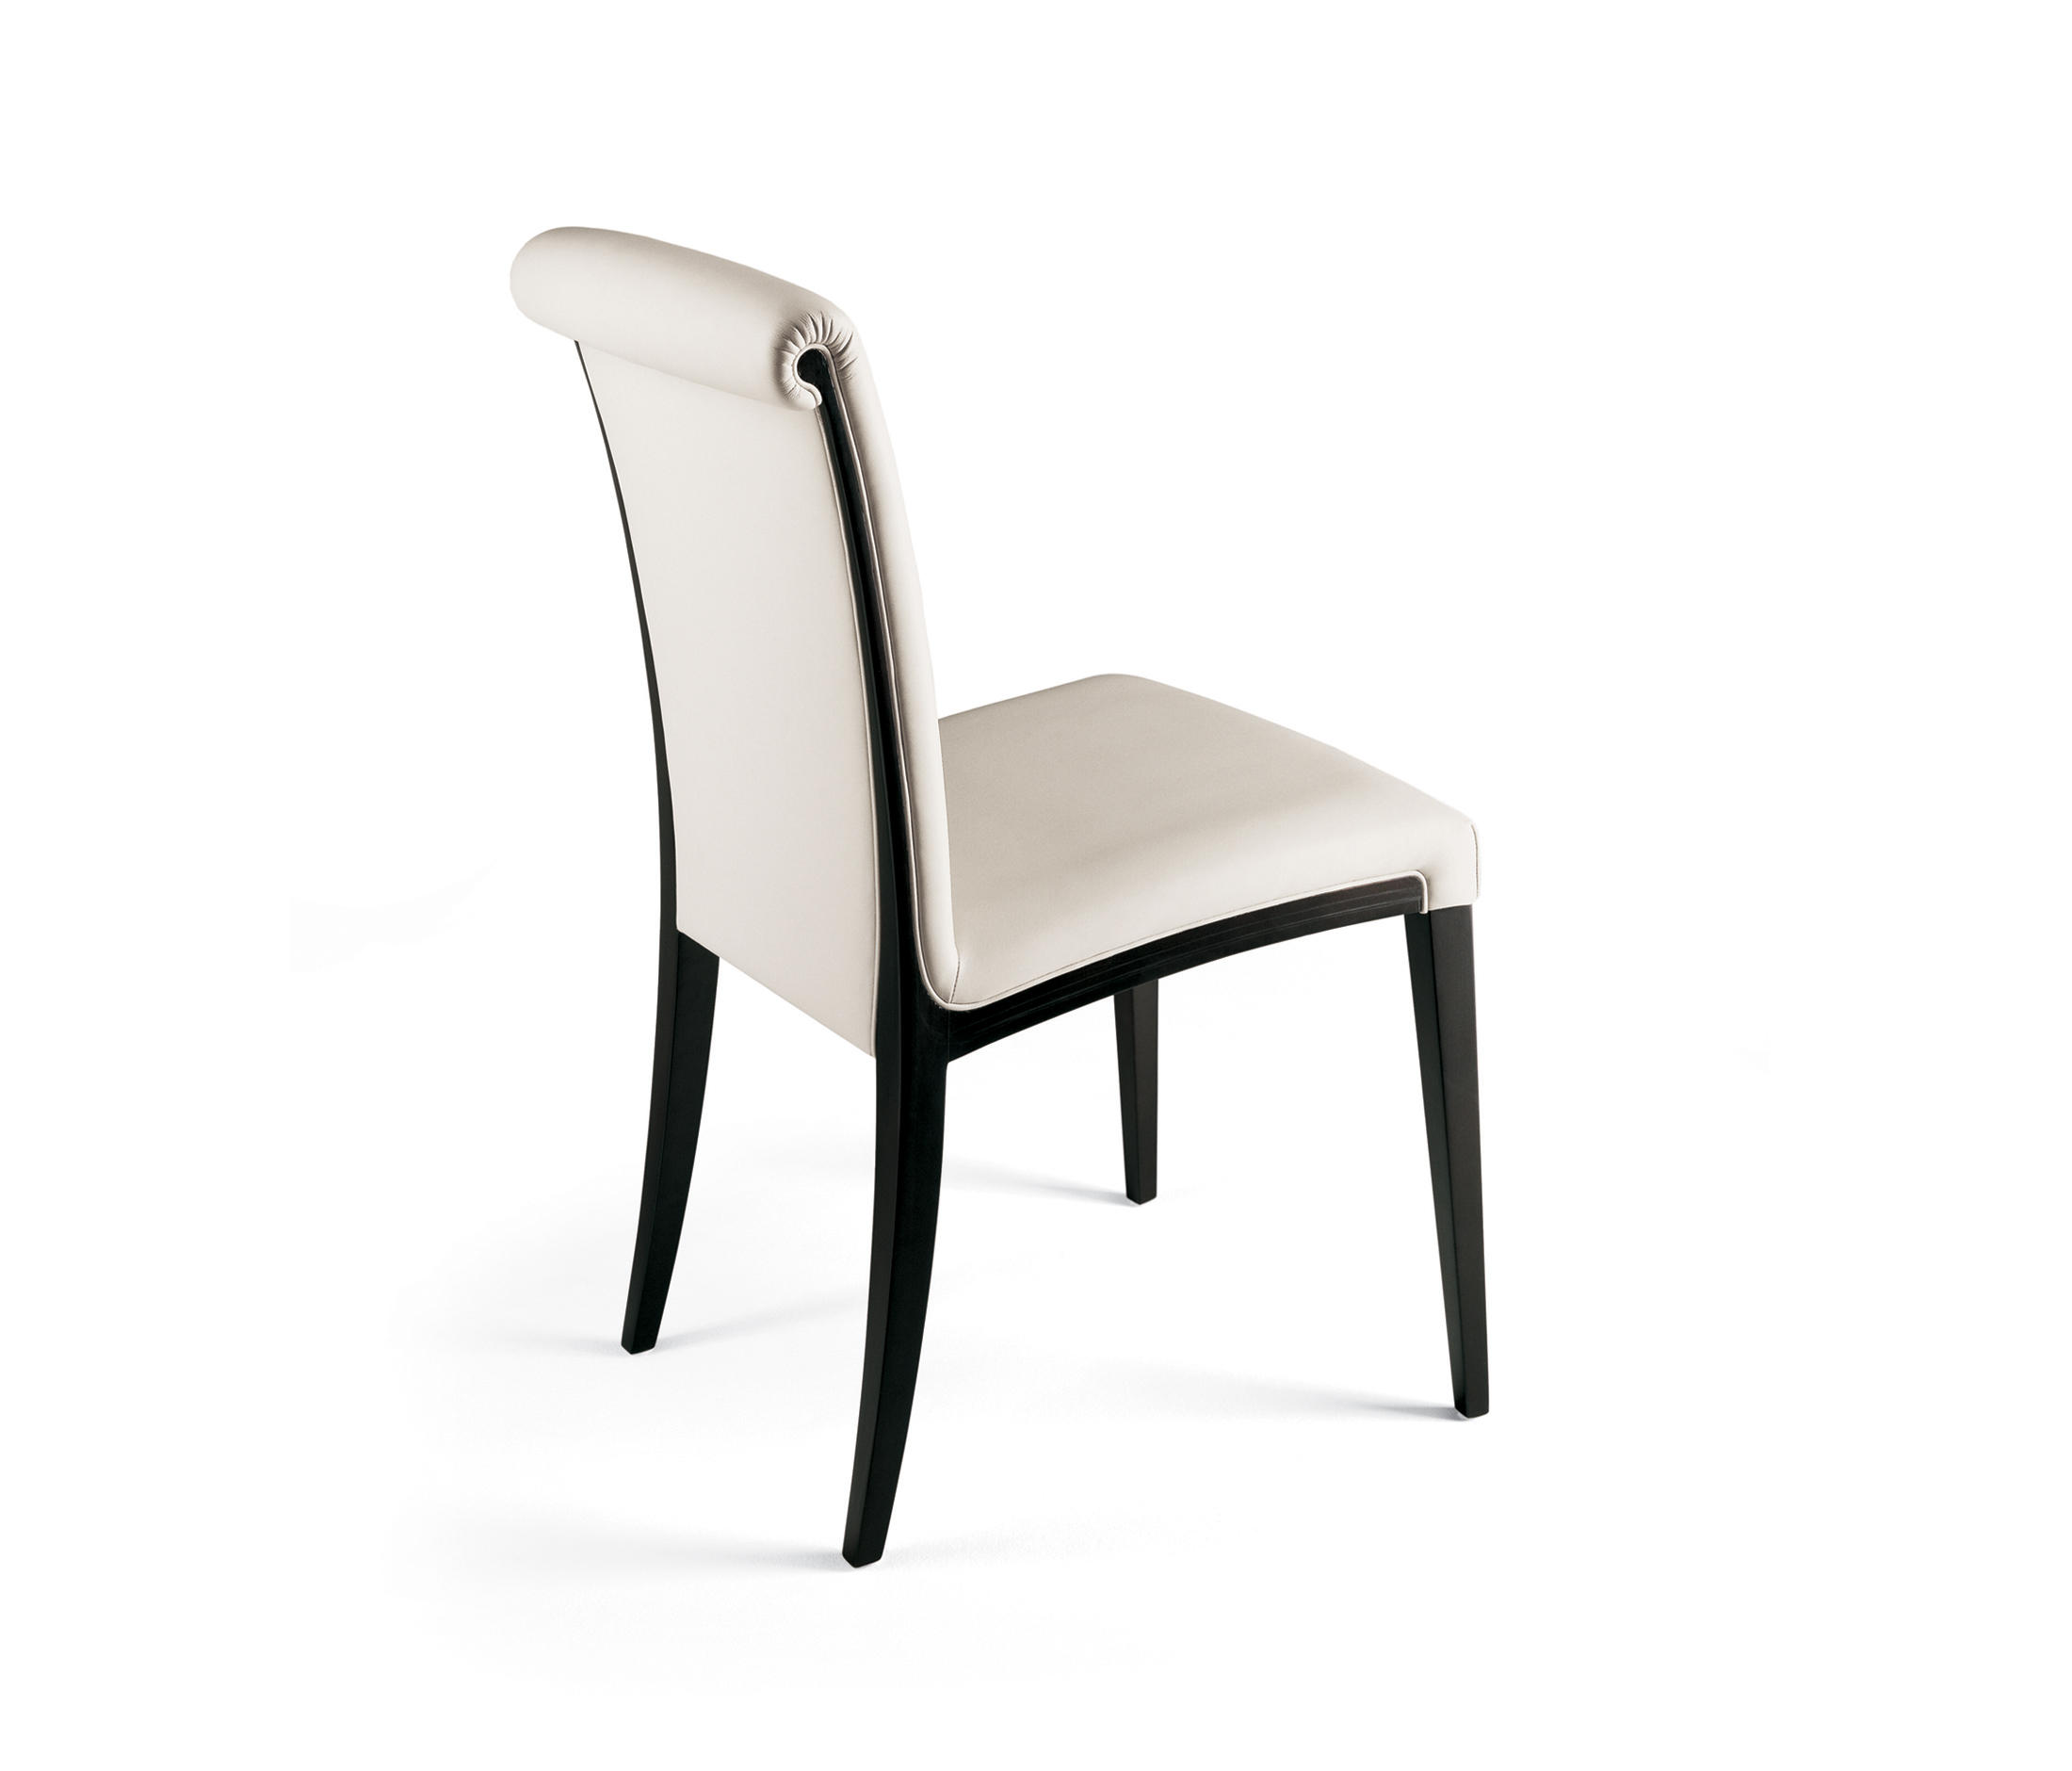 Vittoria Poltrona Frau.Samo Chairs From Poltrona Frau Architonic